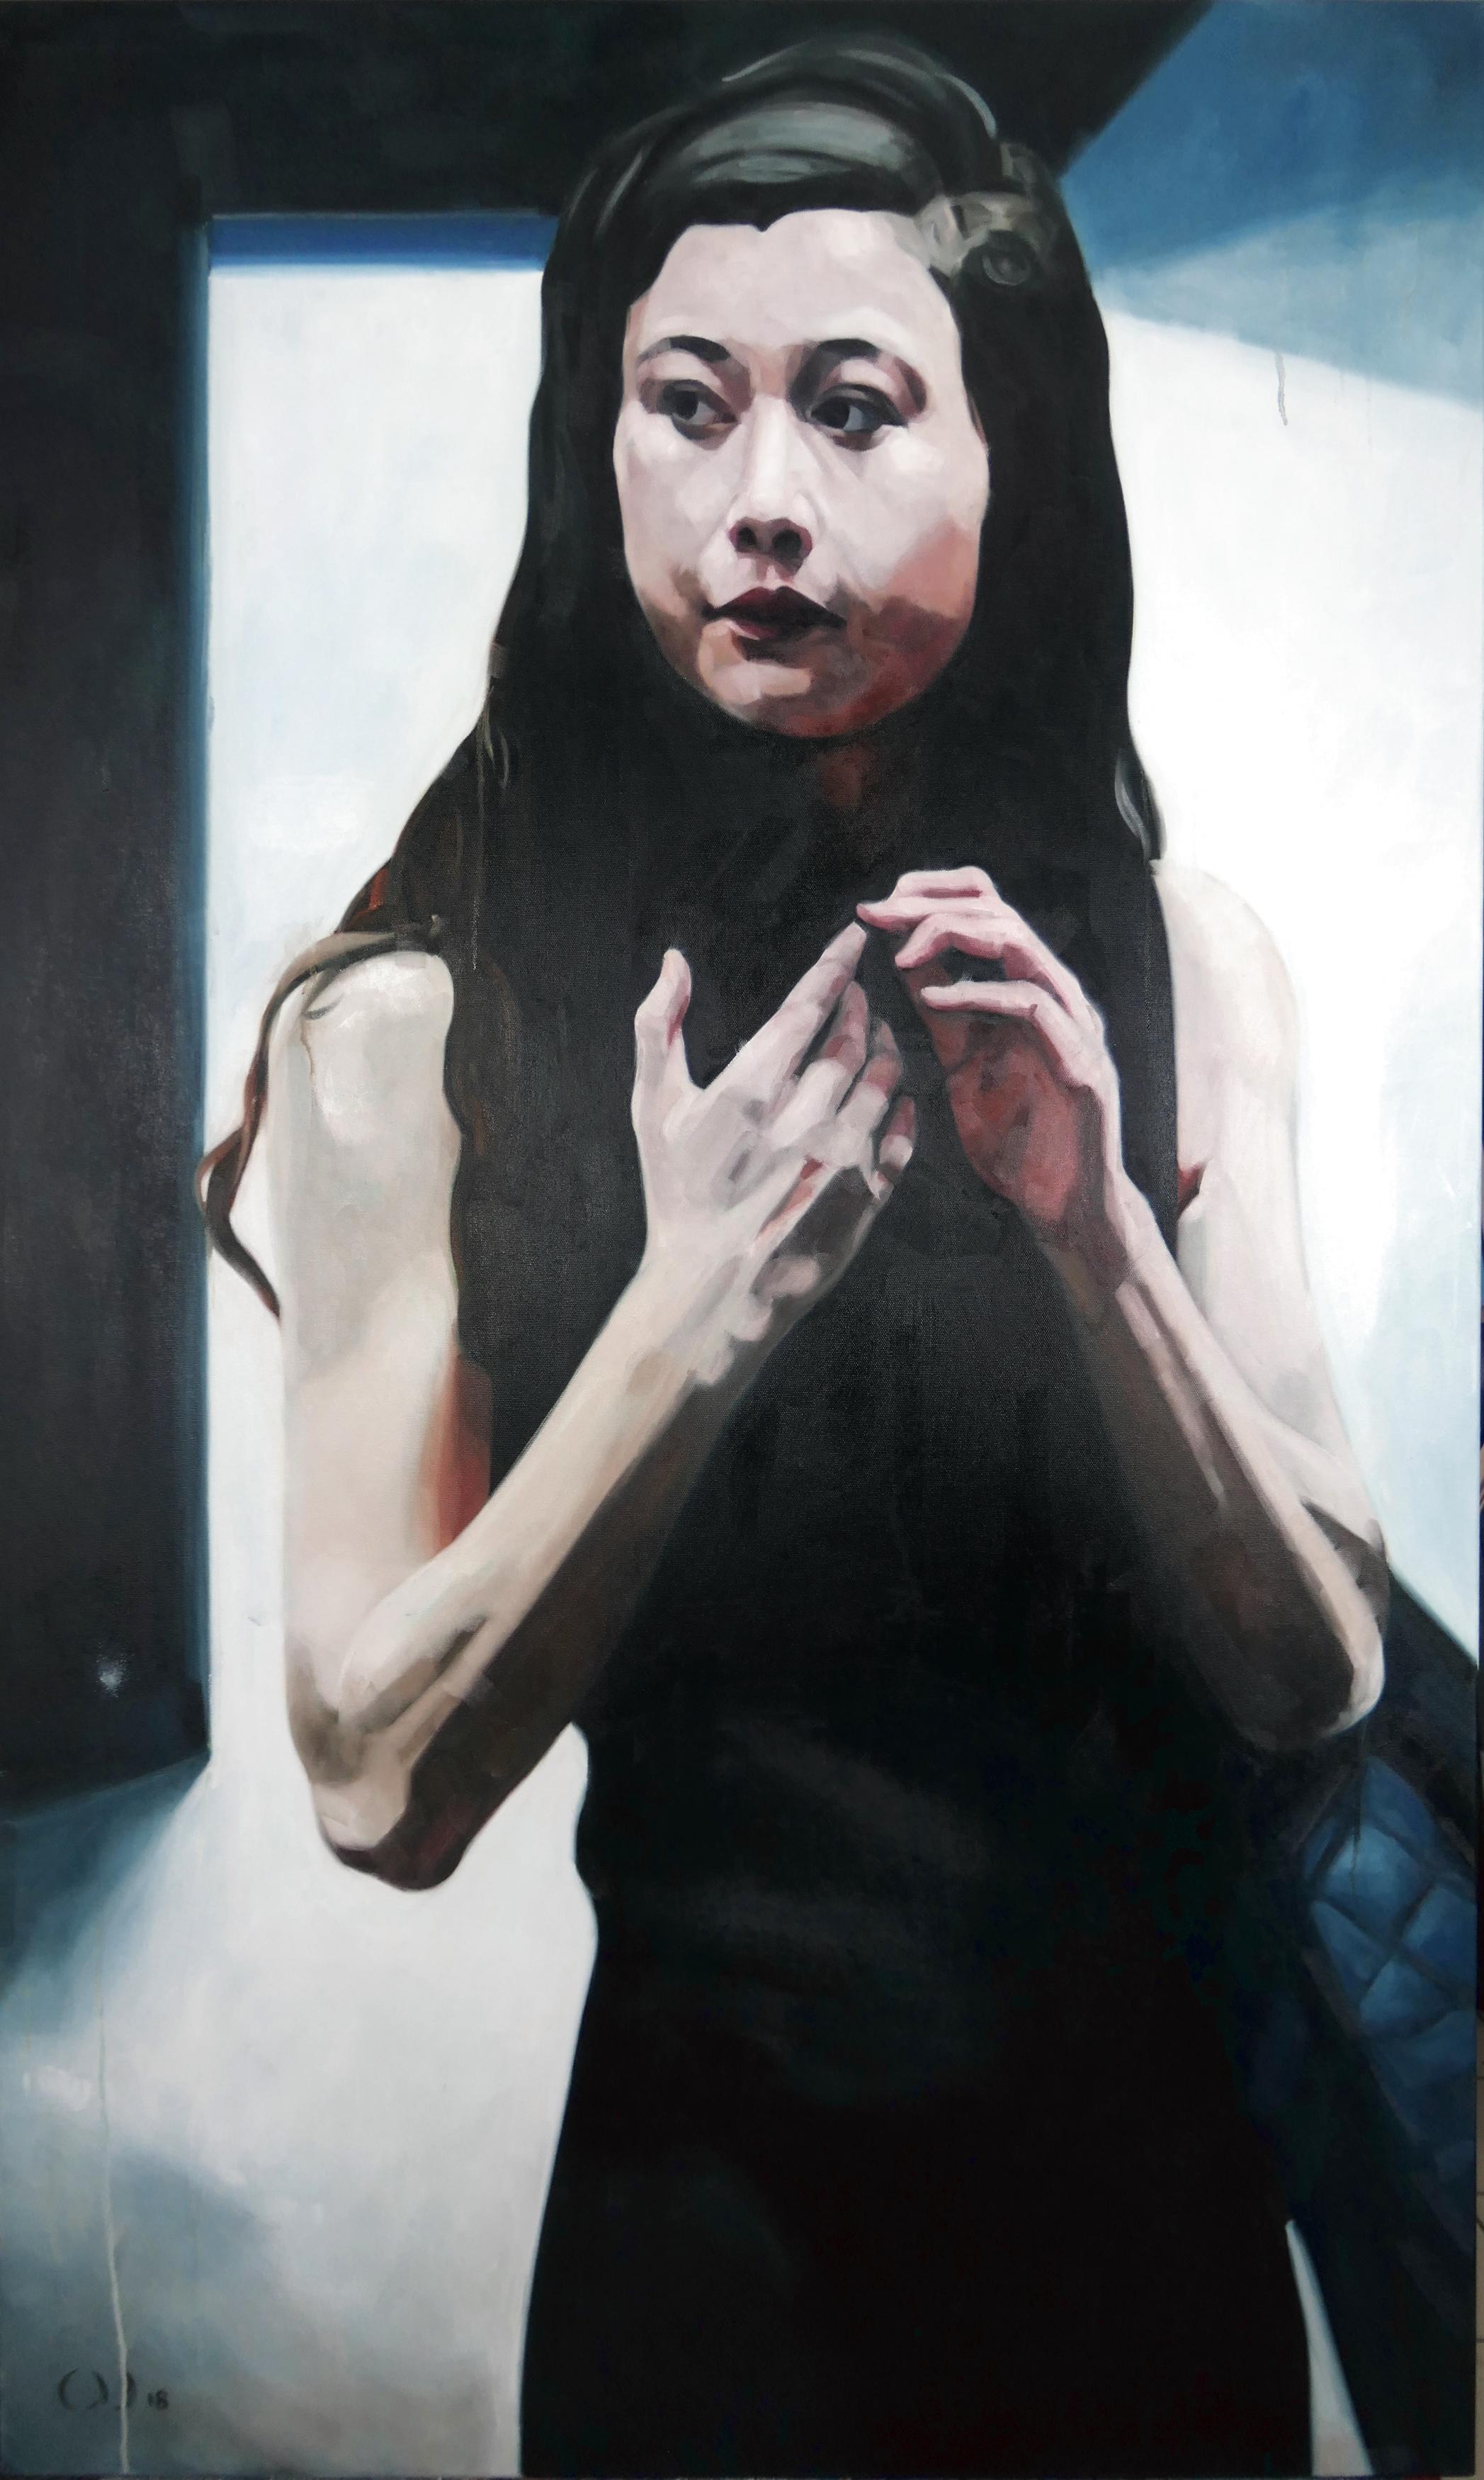 darkroom_Öl_auf_Leinwand_150x90cm_2018